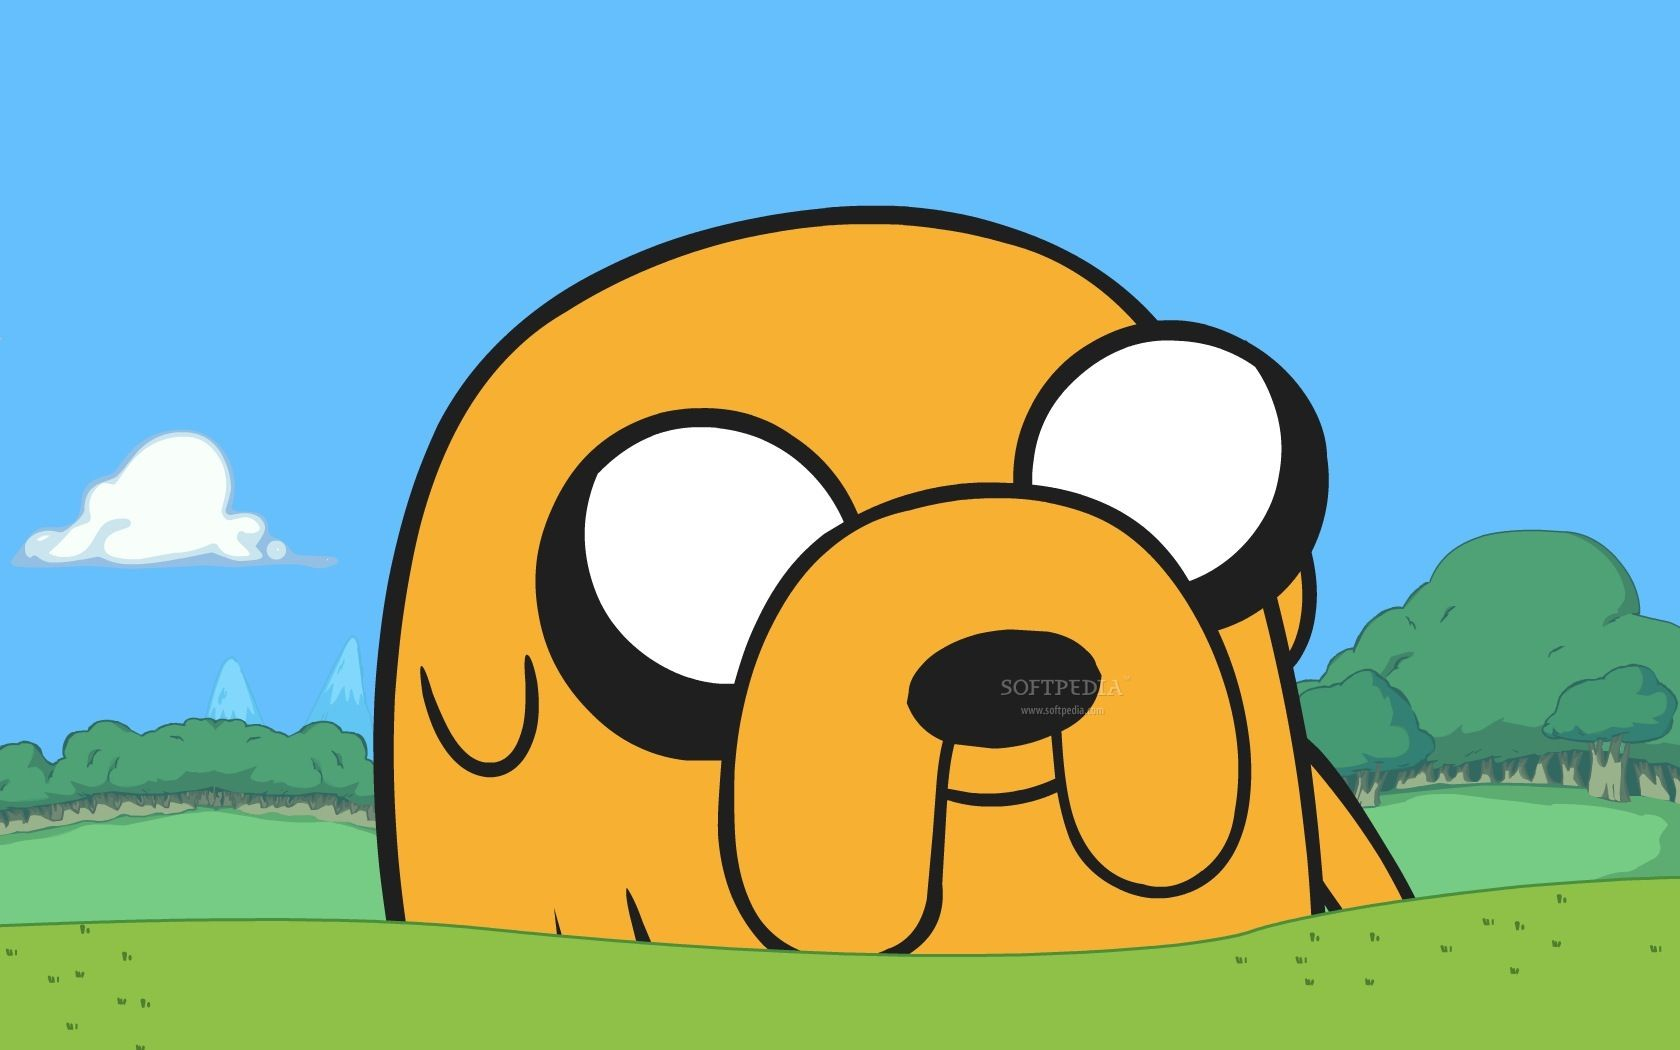 Adventure Time Adventure Time Wallpaper 1680x1050 Adventure Time With Finn And Adventure Time Wallpaper Fin And Jake Adventure Time